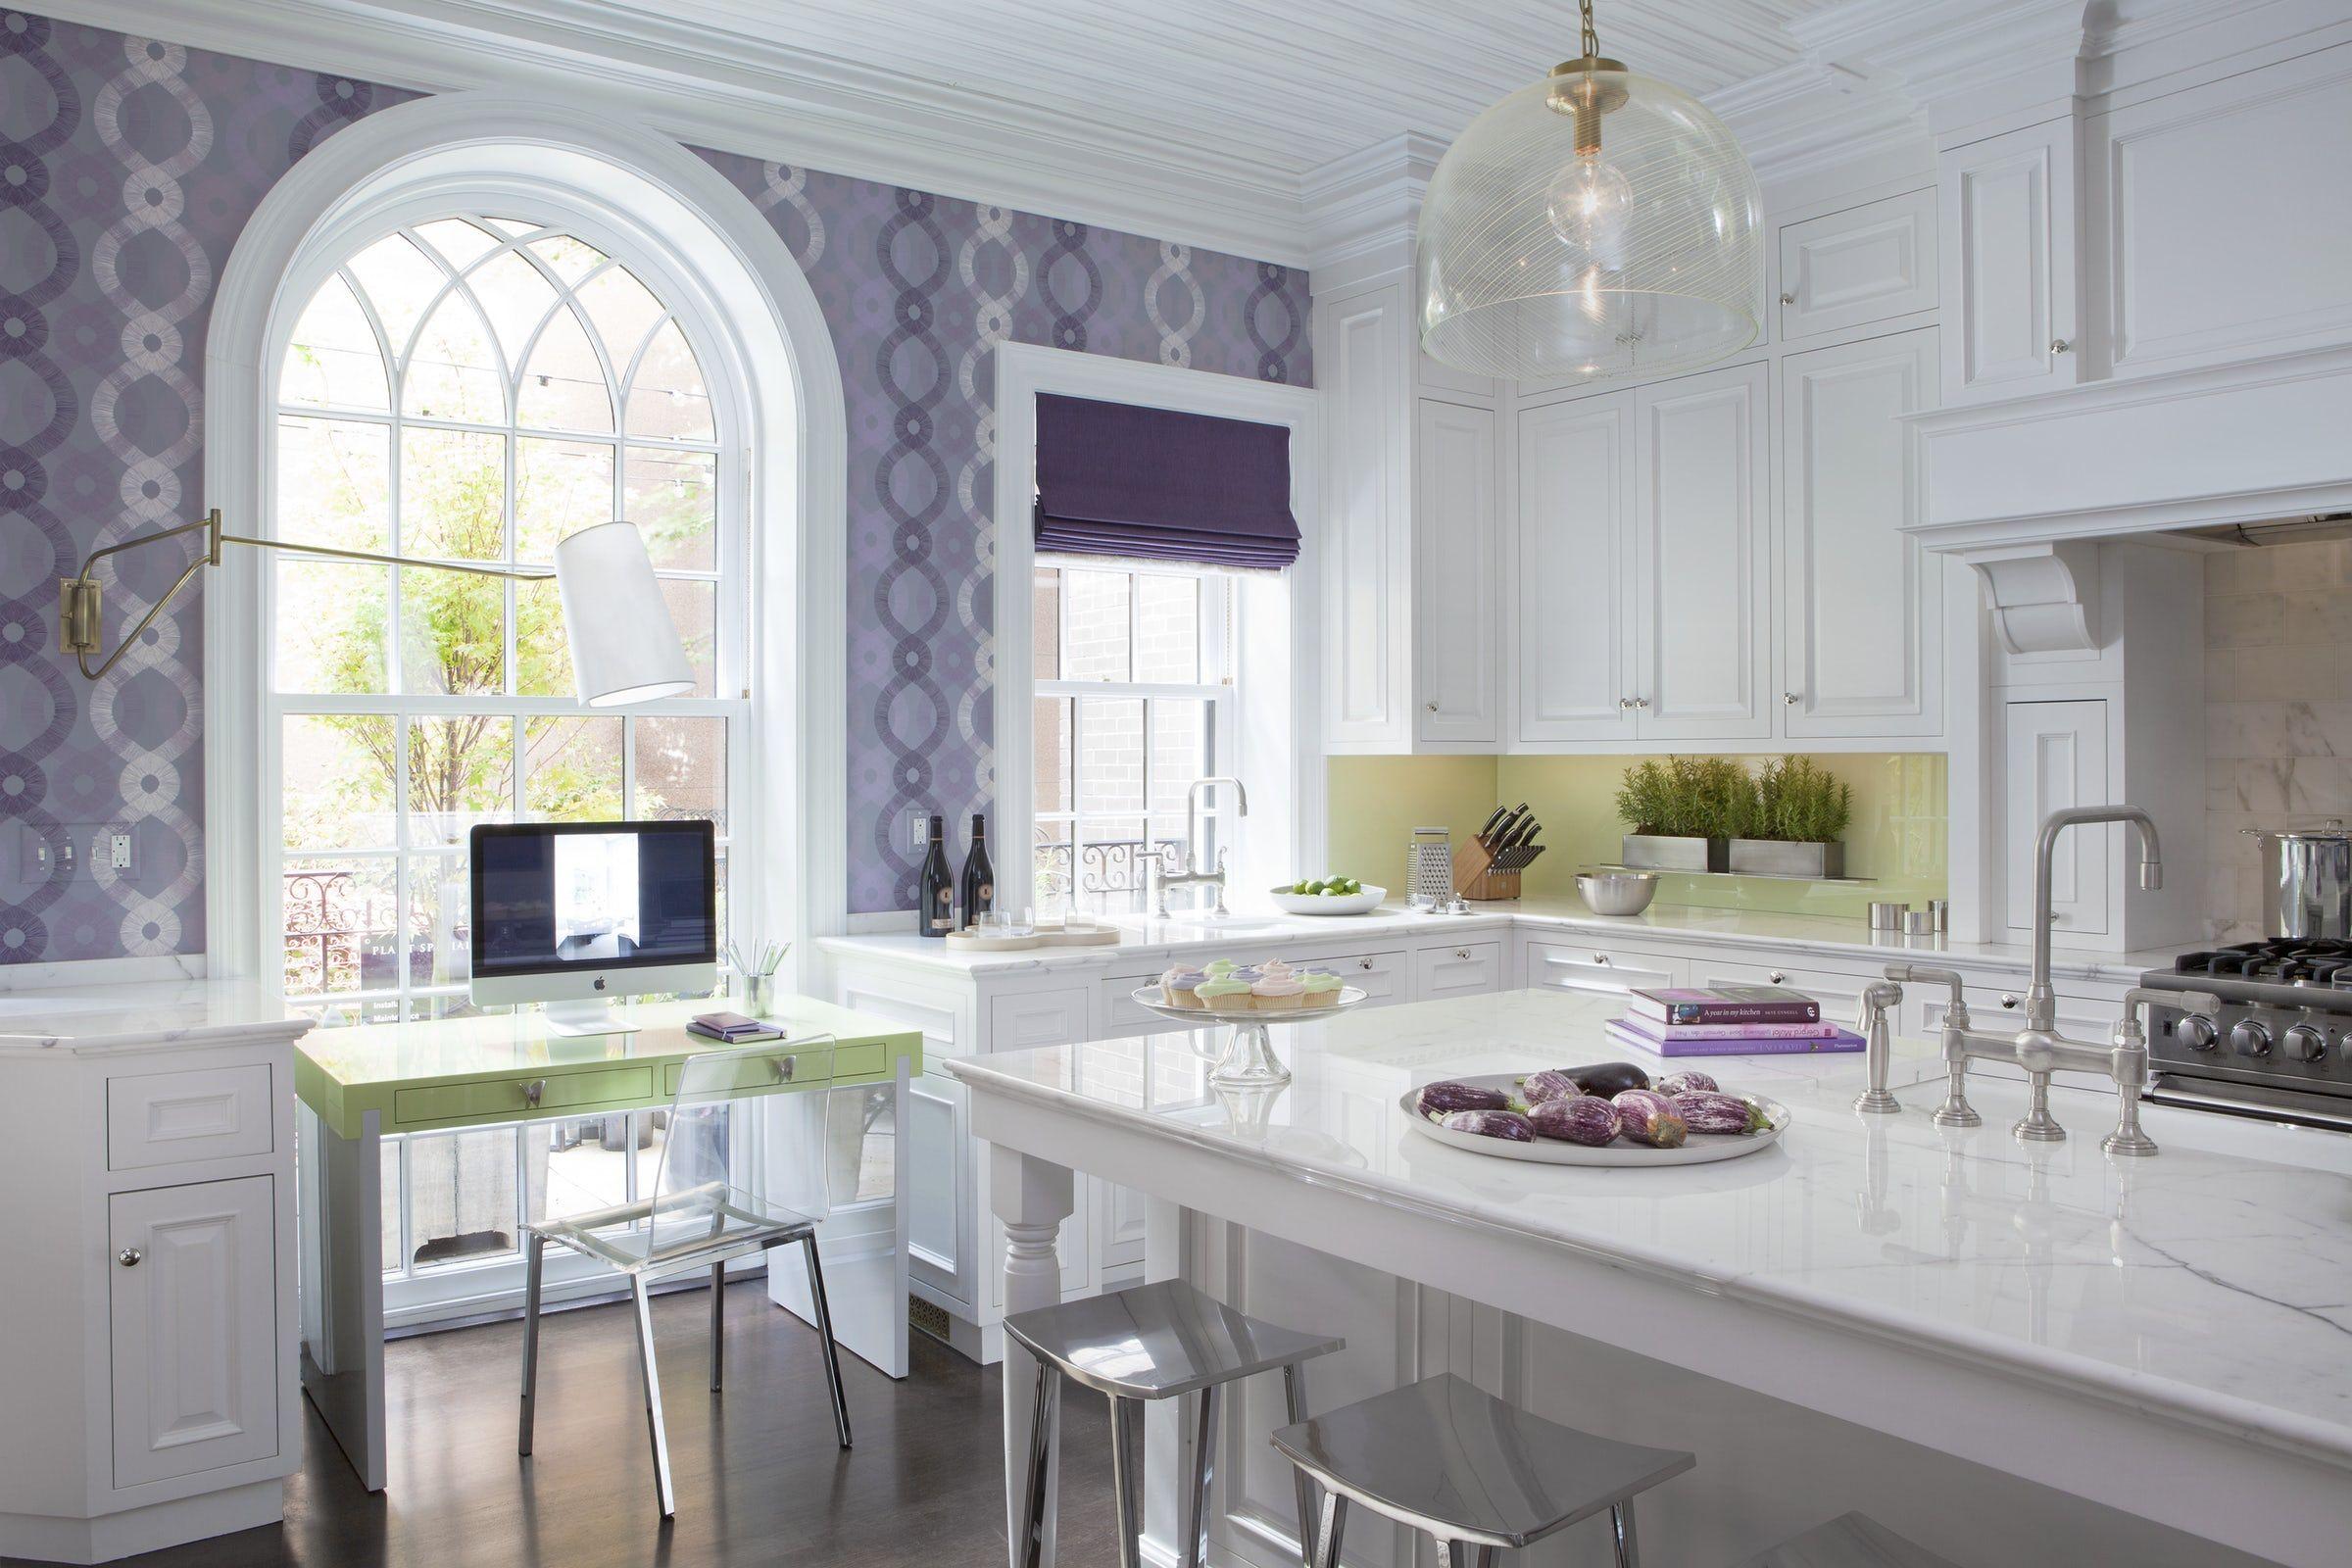 gorgeous kitchen wallpaper ideas best wallpaper for kitchen walls rh elledecor com